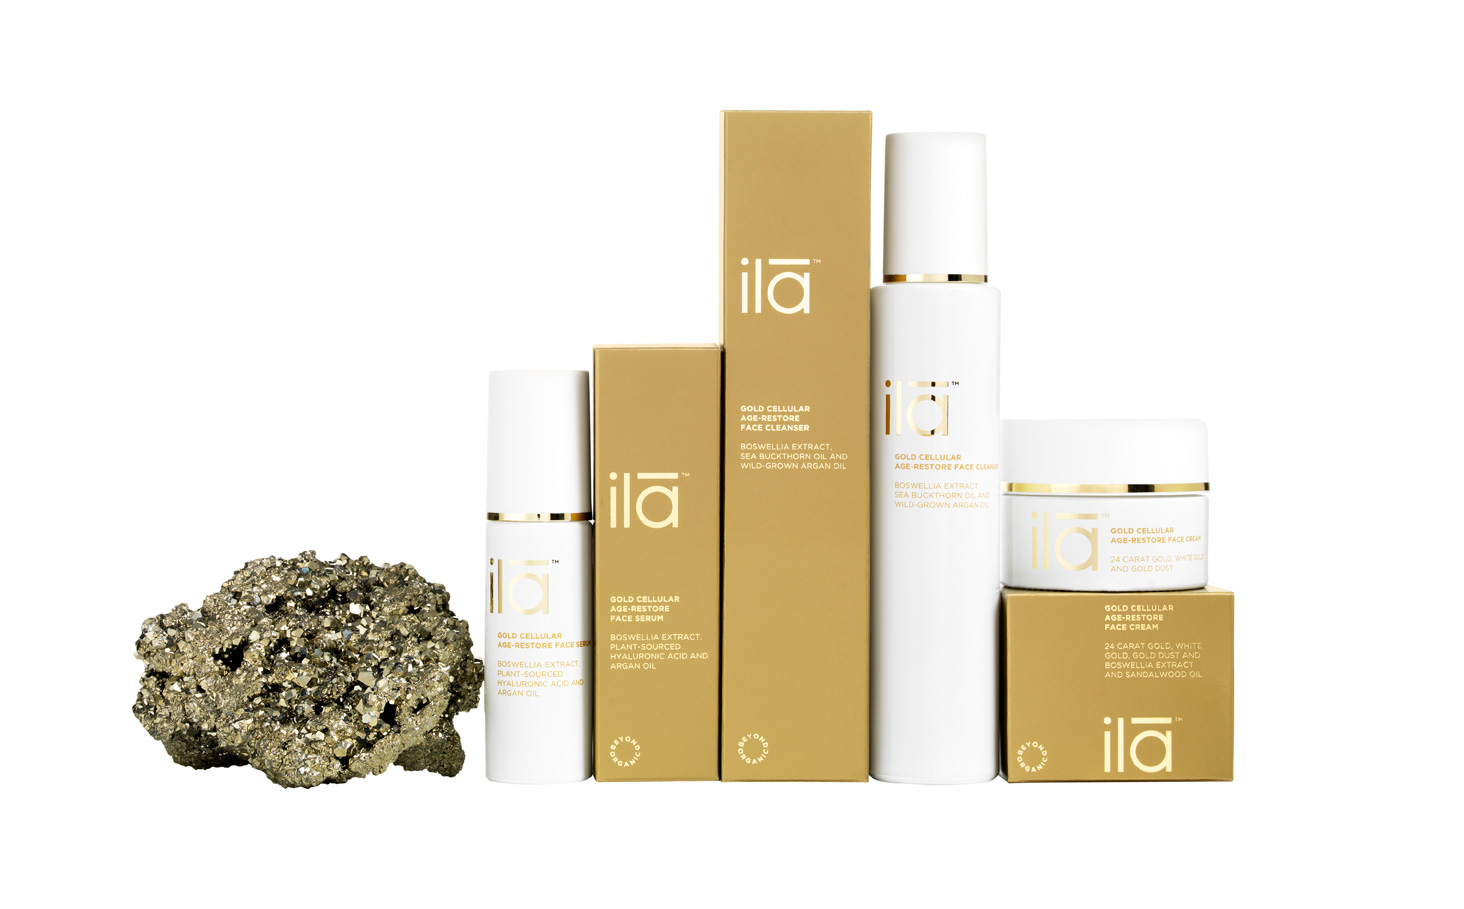 ila-spa-white-gold